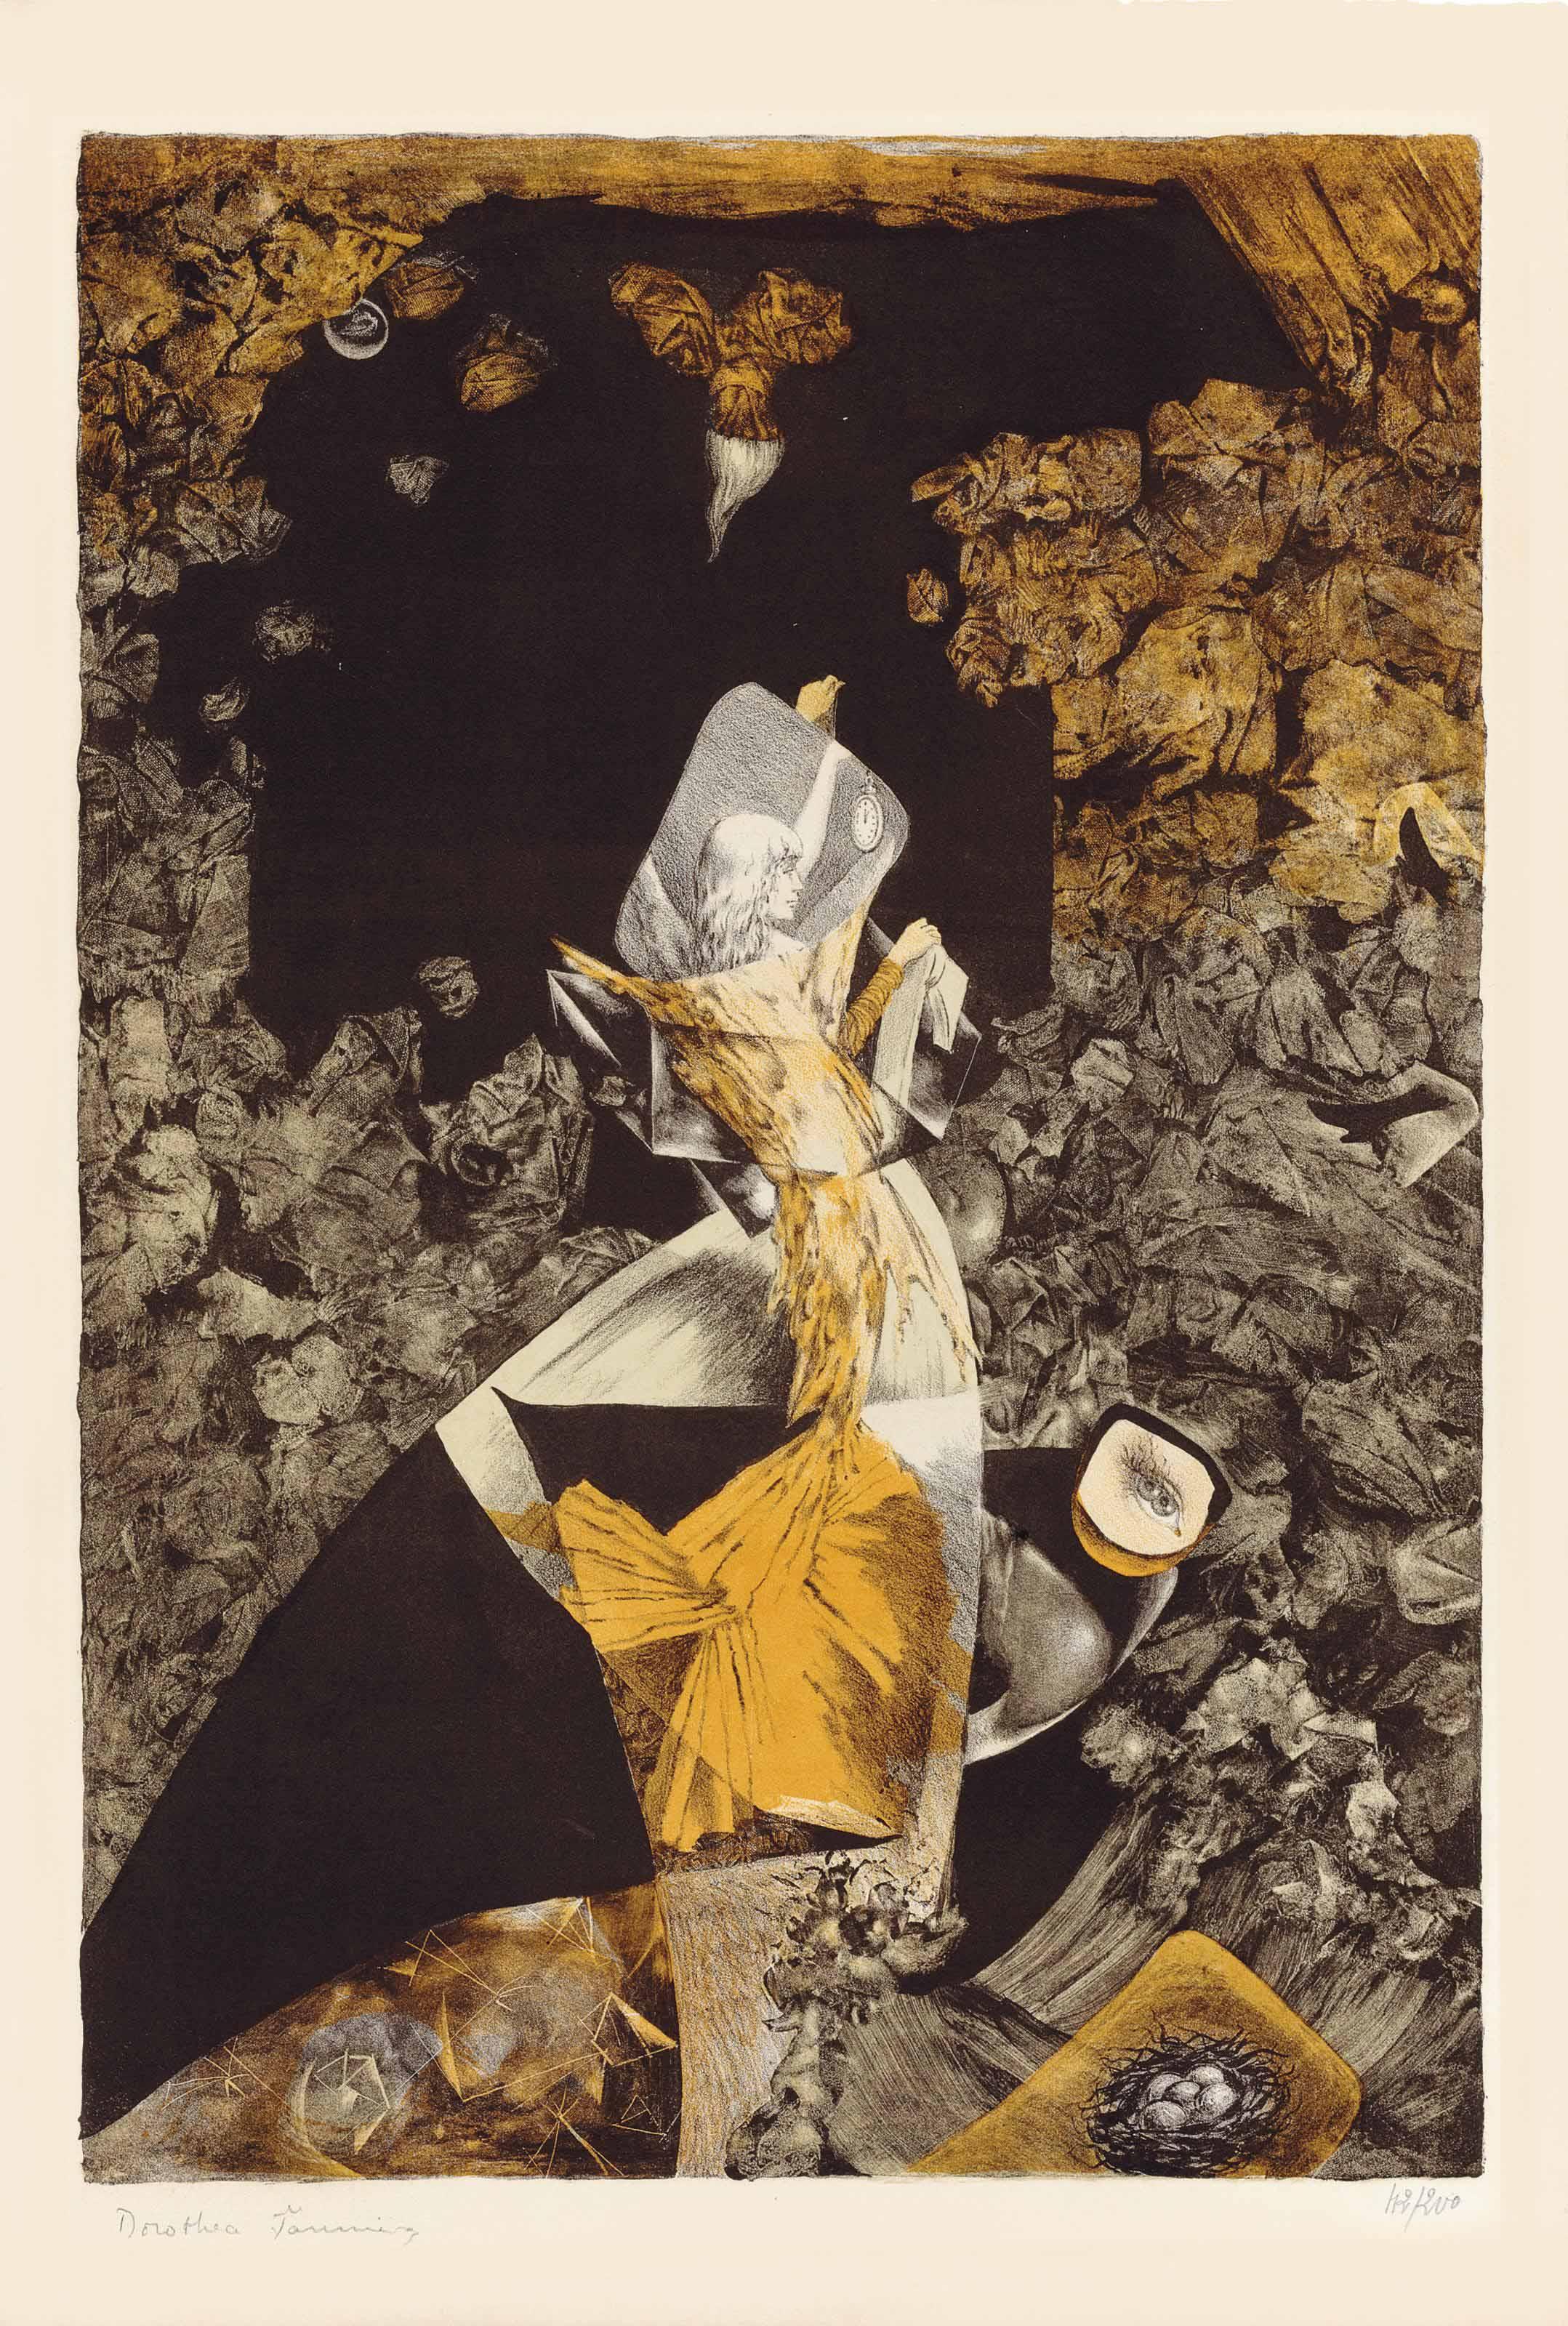 DOROTHEA TANNING (1910-2012)